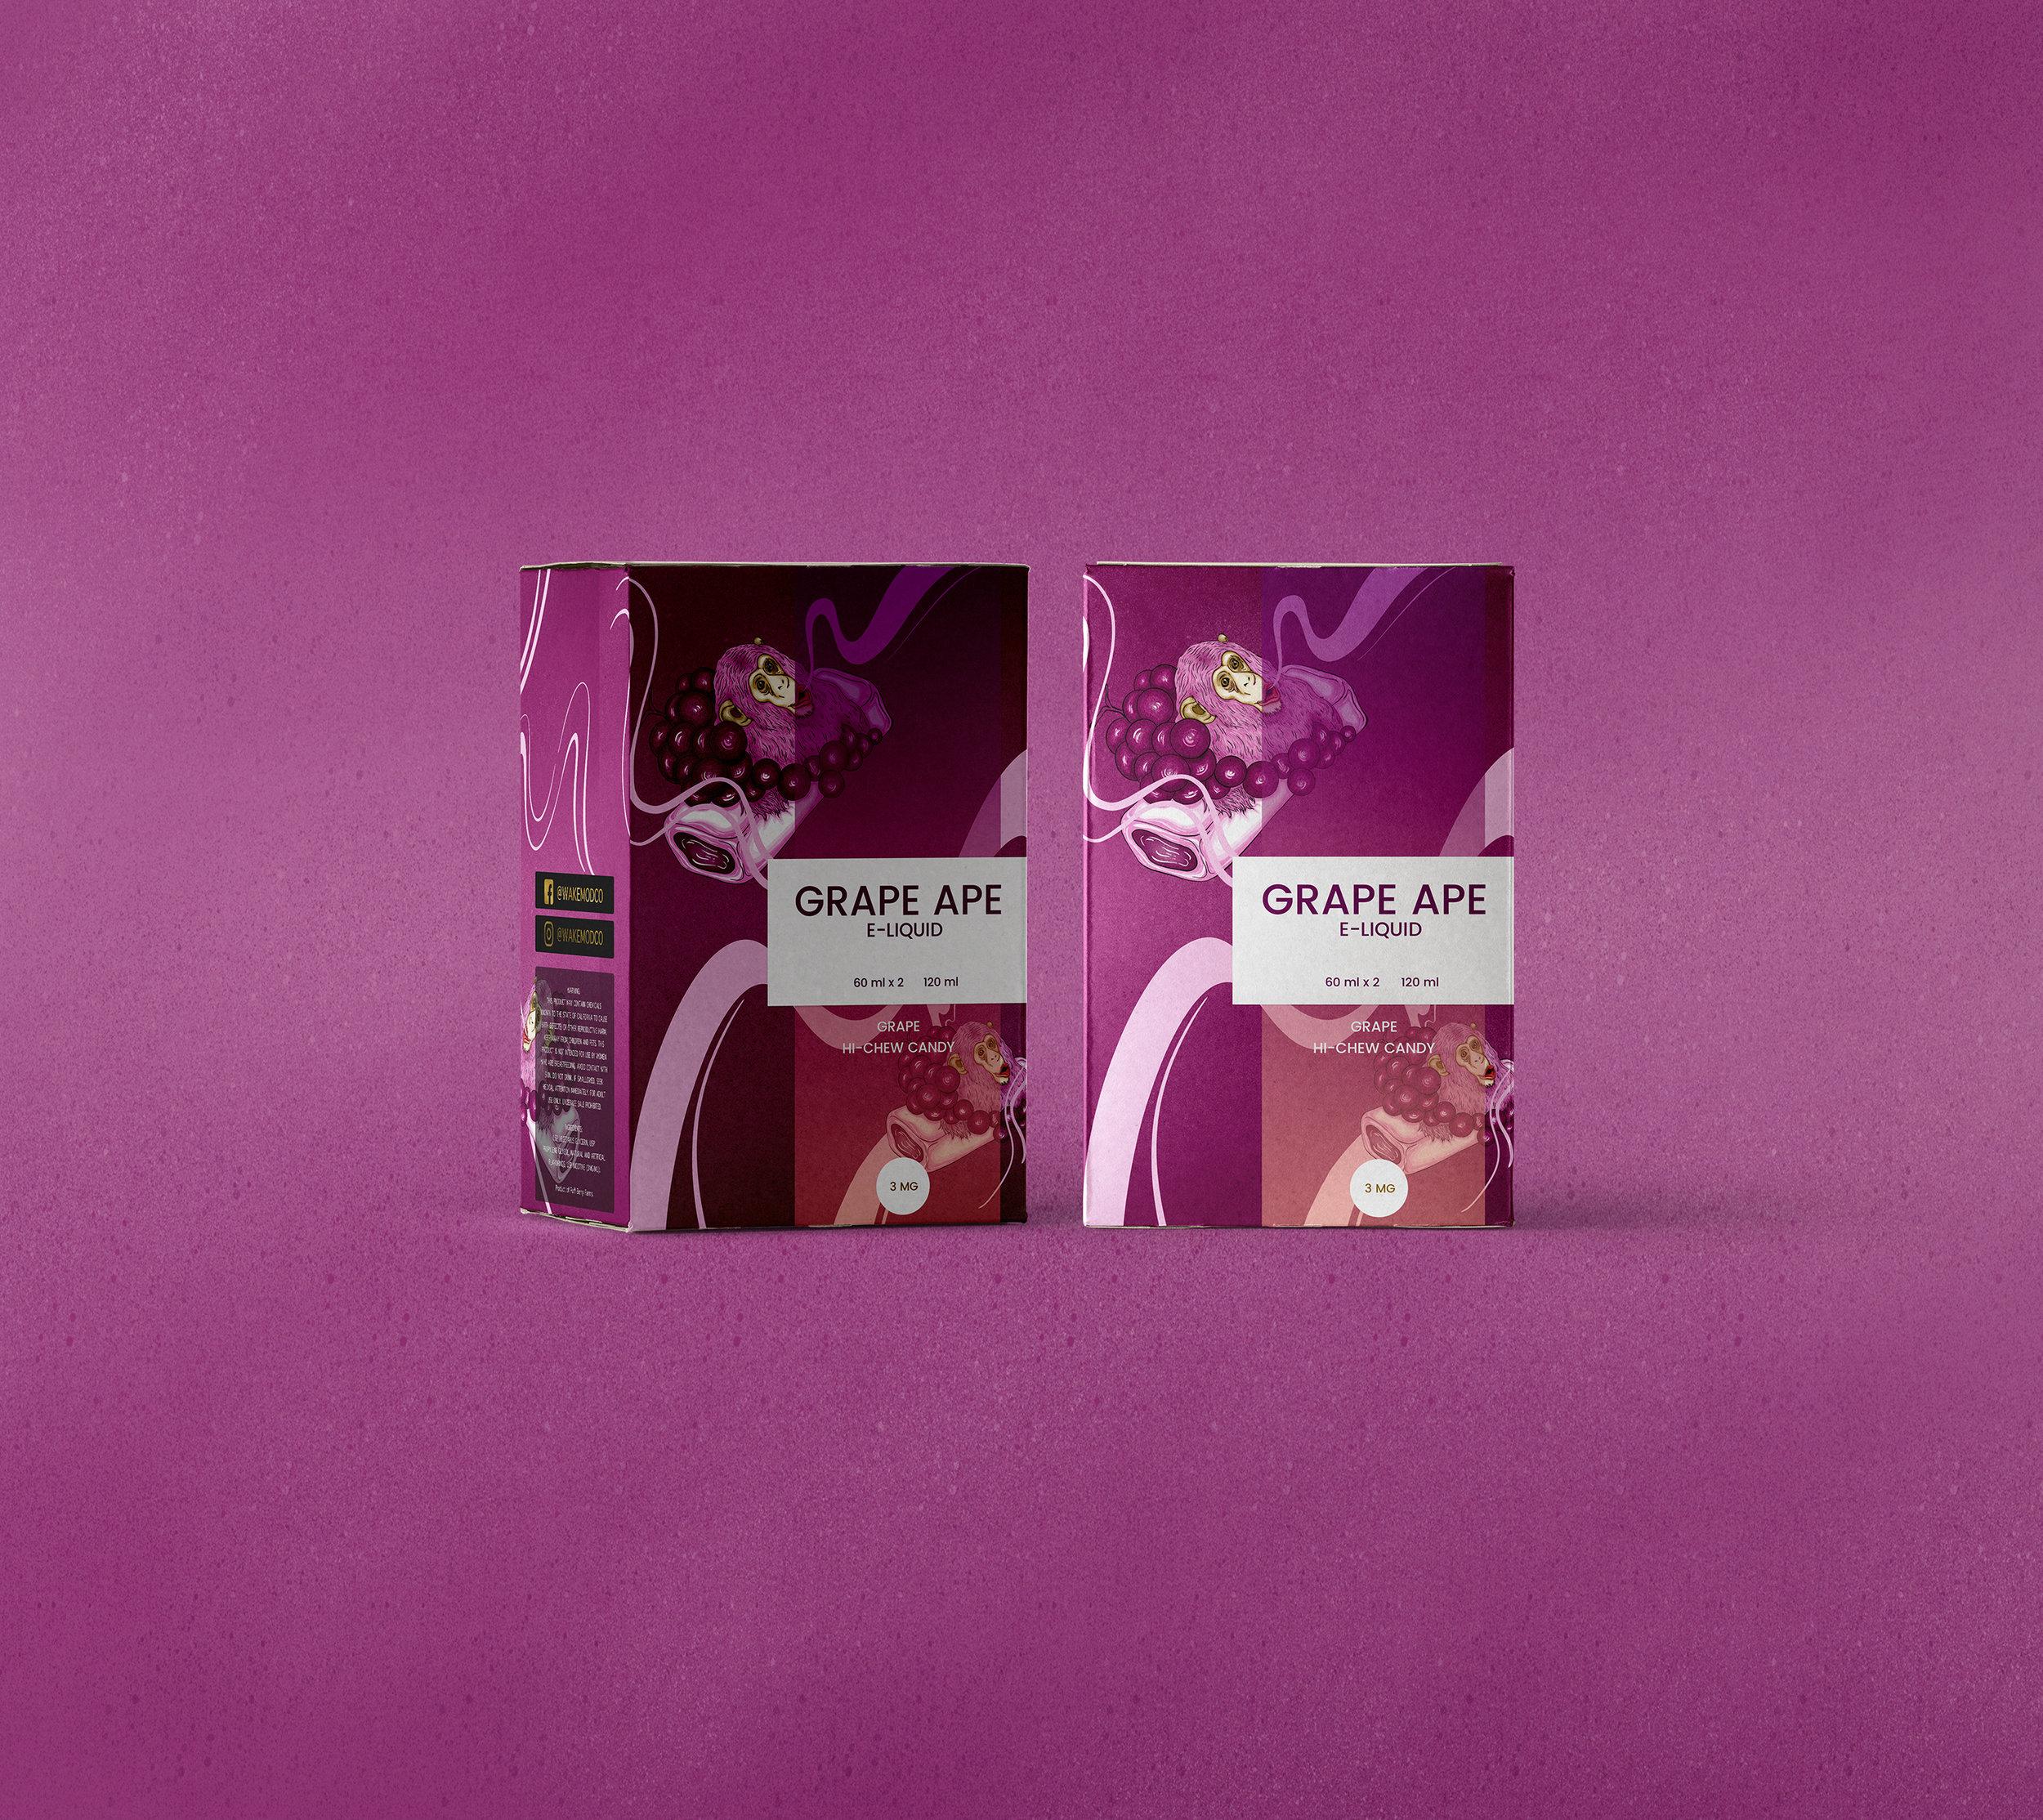 Grape Ape: Grape Hi-chew Candy